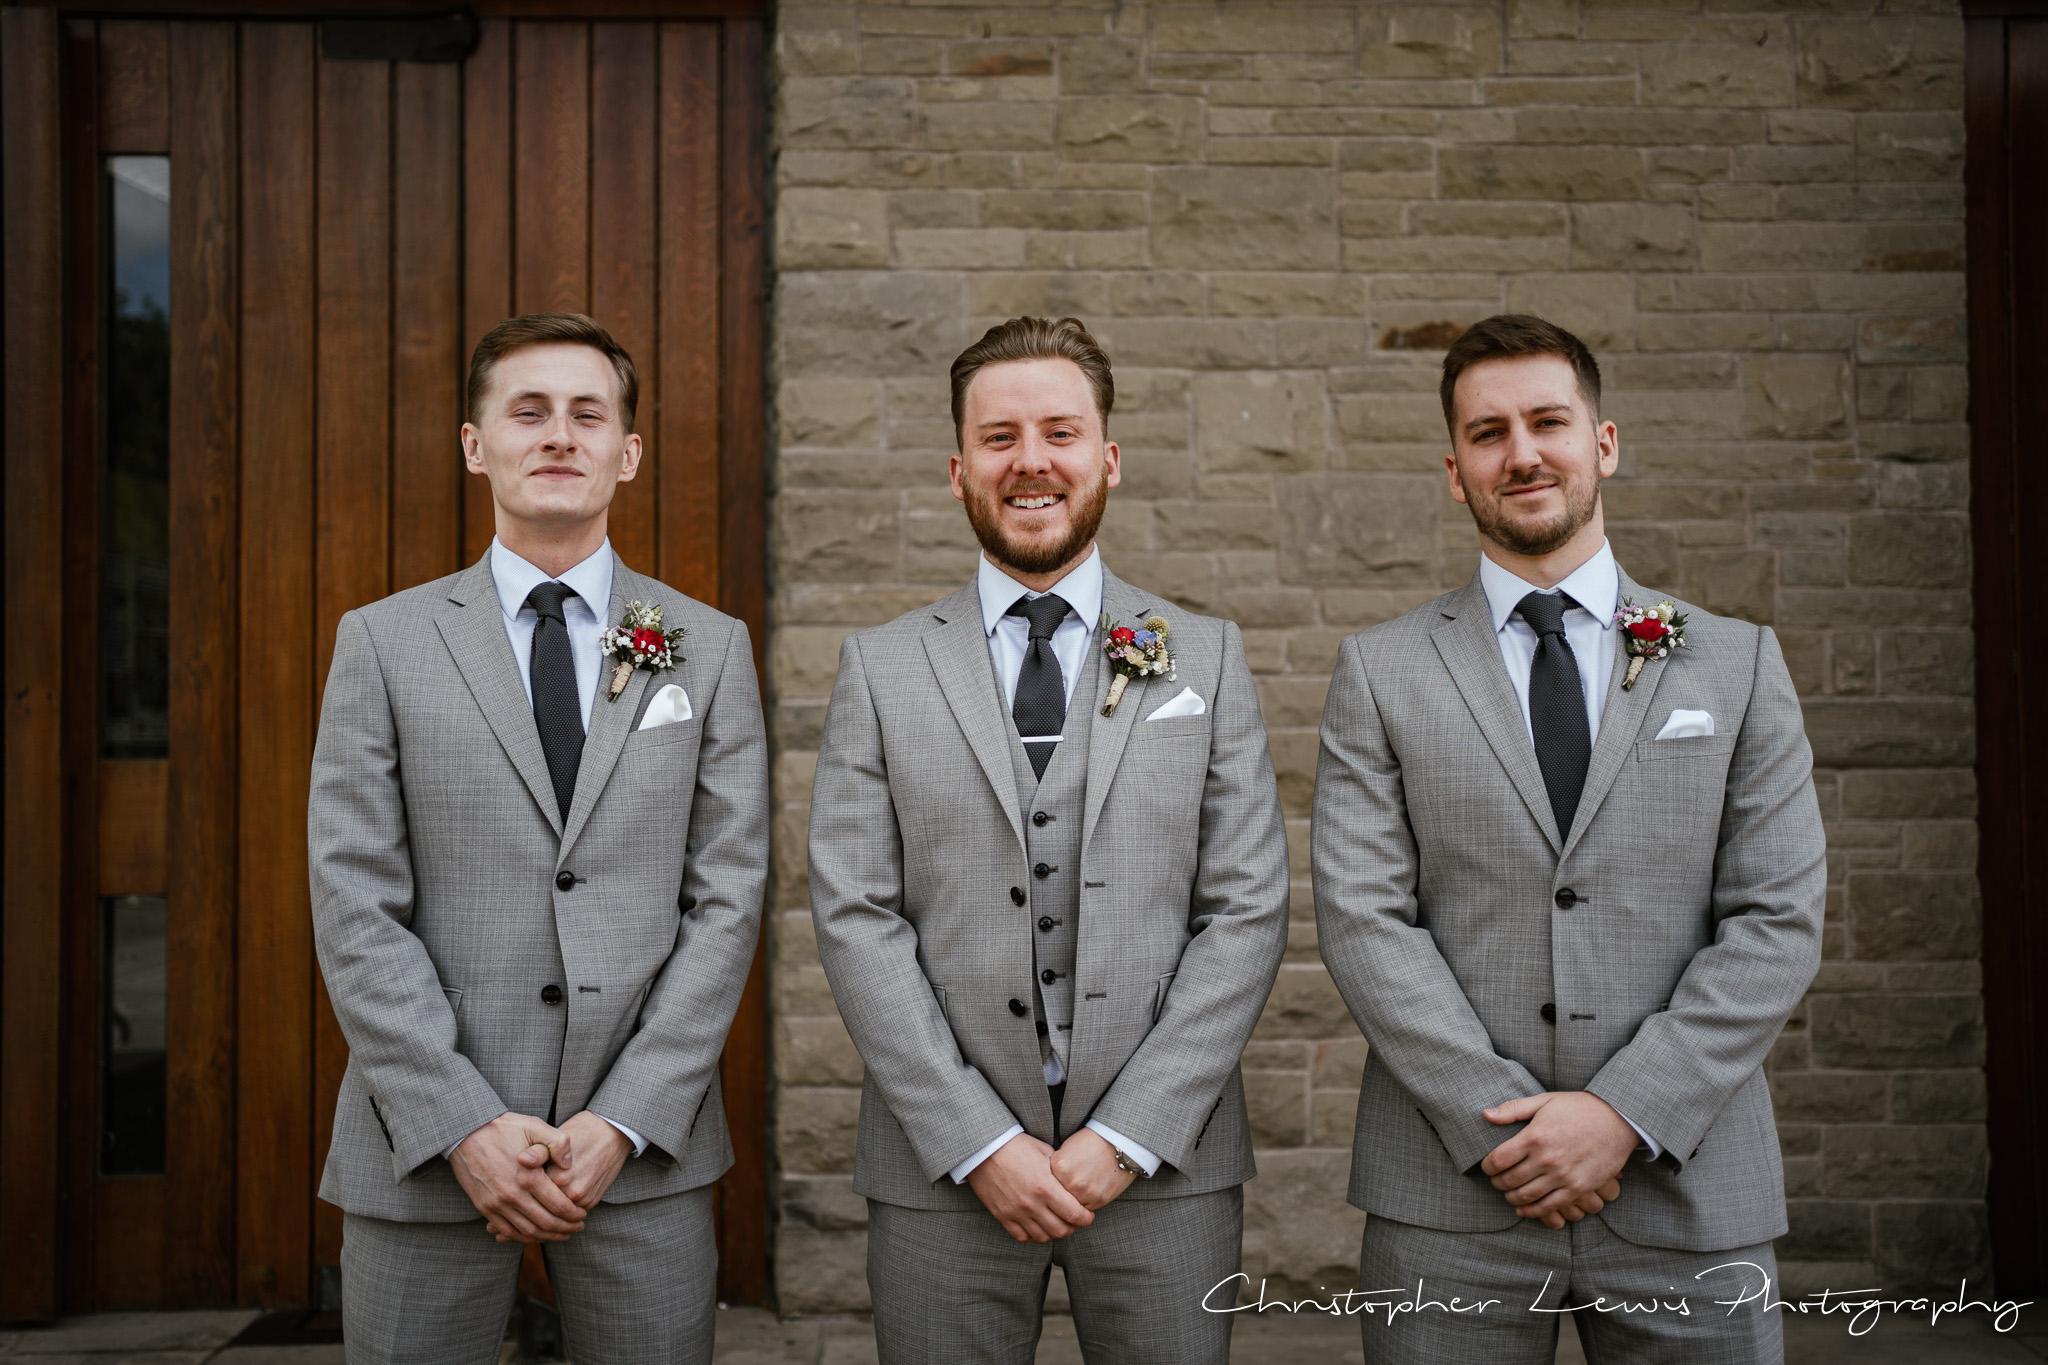 Samlesbury Hall Wedding groom and groomsmen